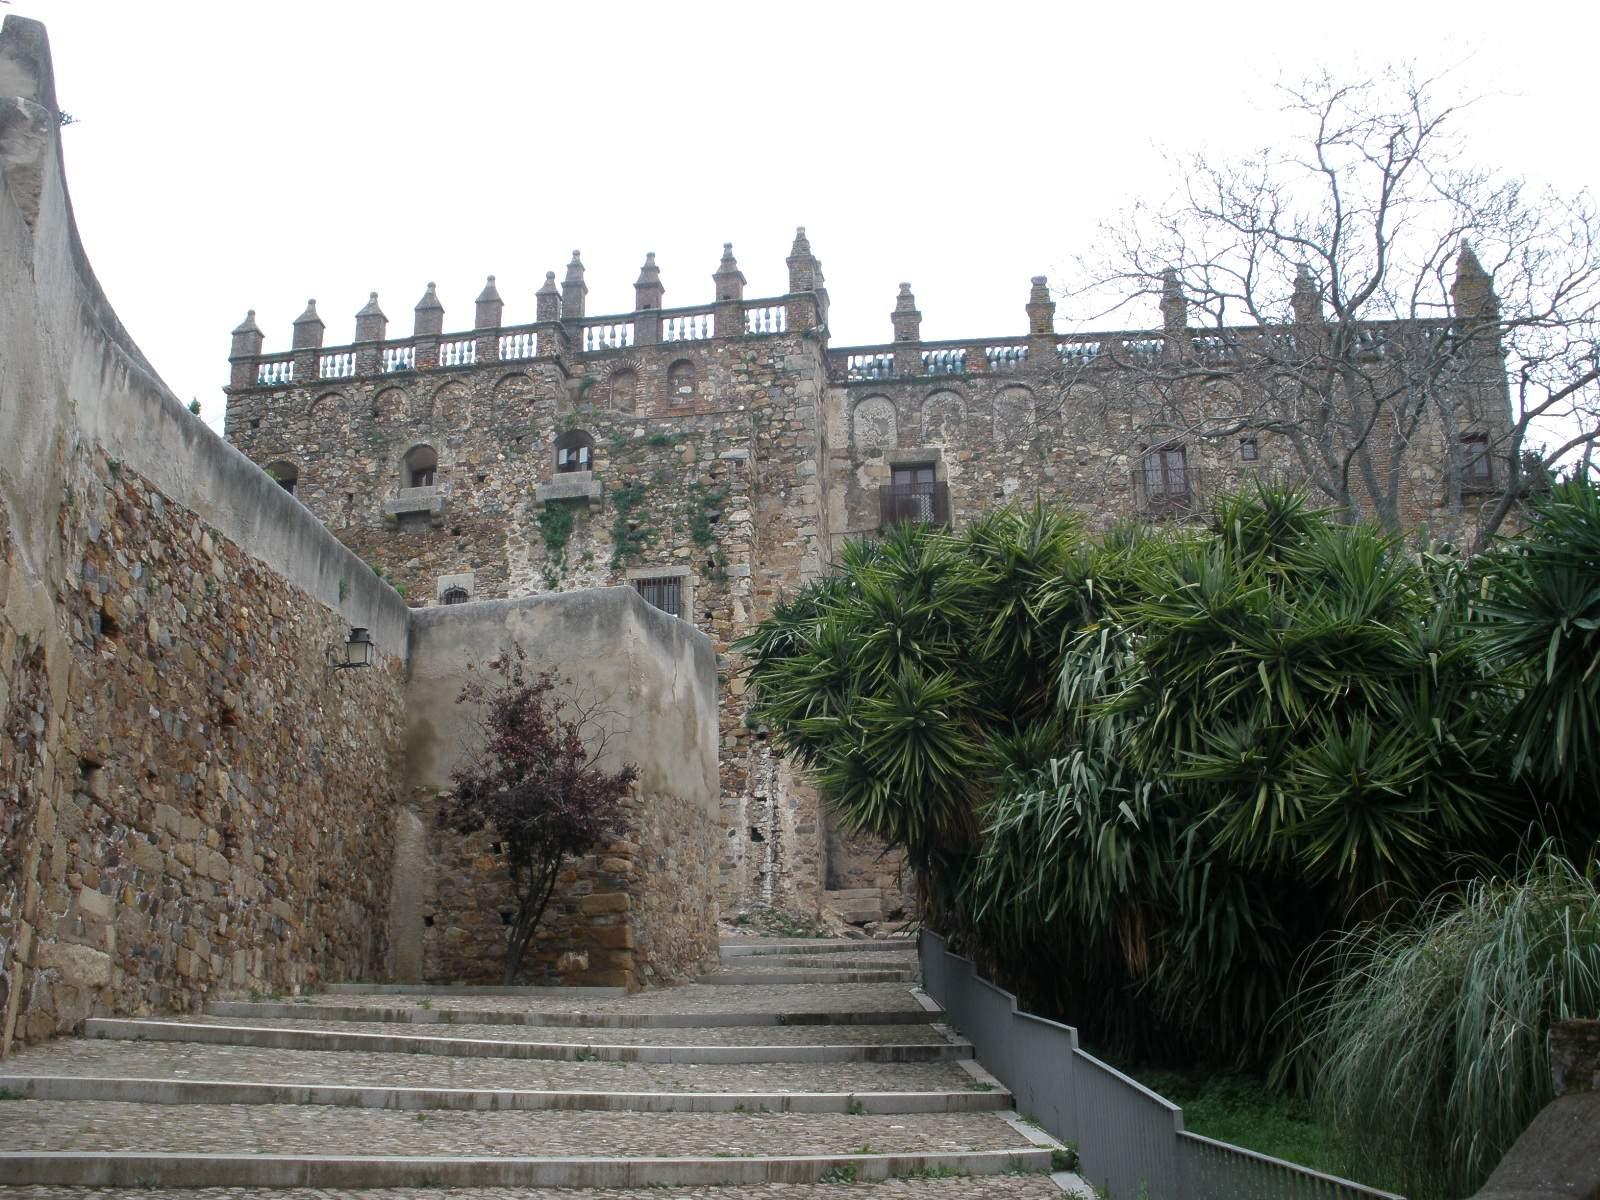 File:Cáceres - Palacio de las Veletas (Museo de Cáceres) 2.jpg - Wikimedia Co...